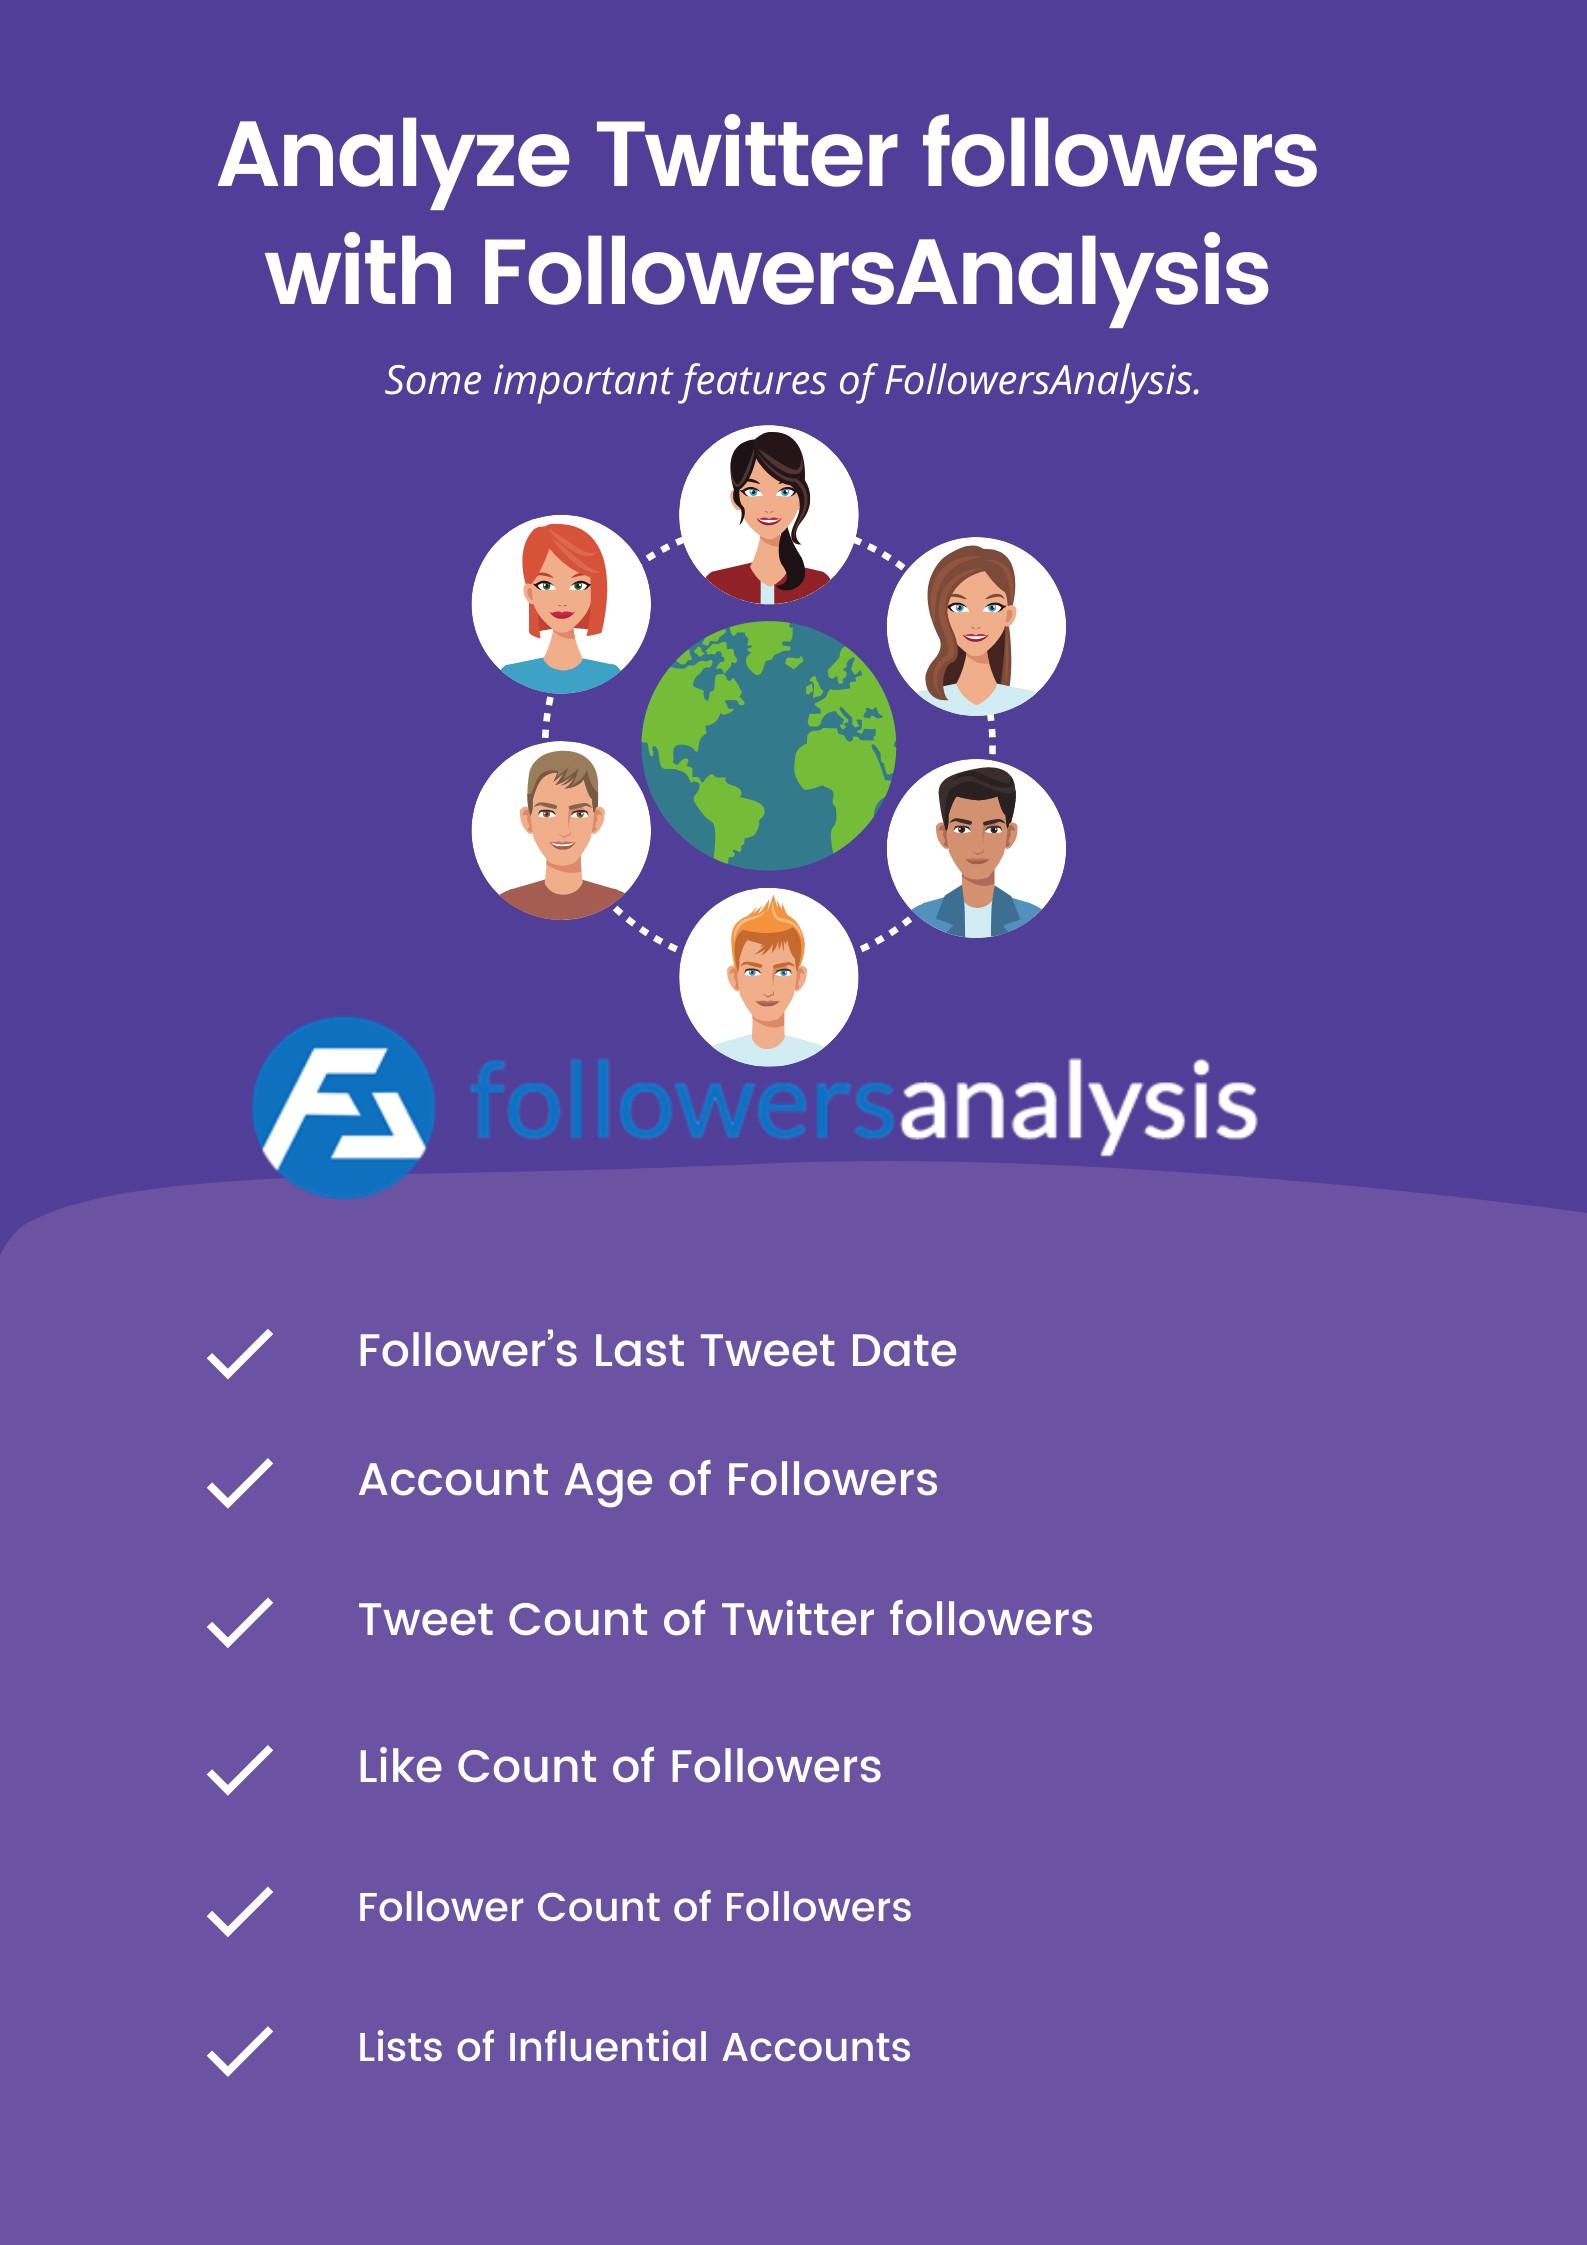 Analyze Twitter followers with FollowersAnalysis